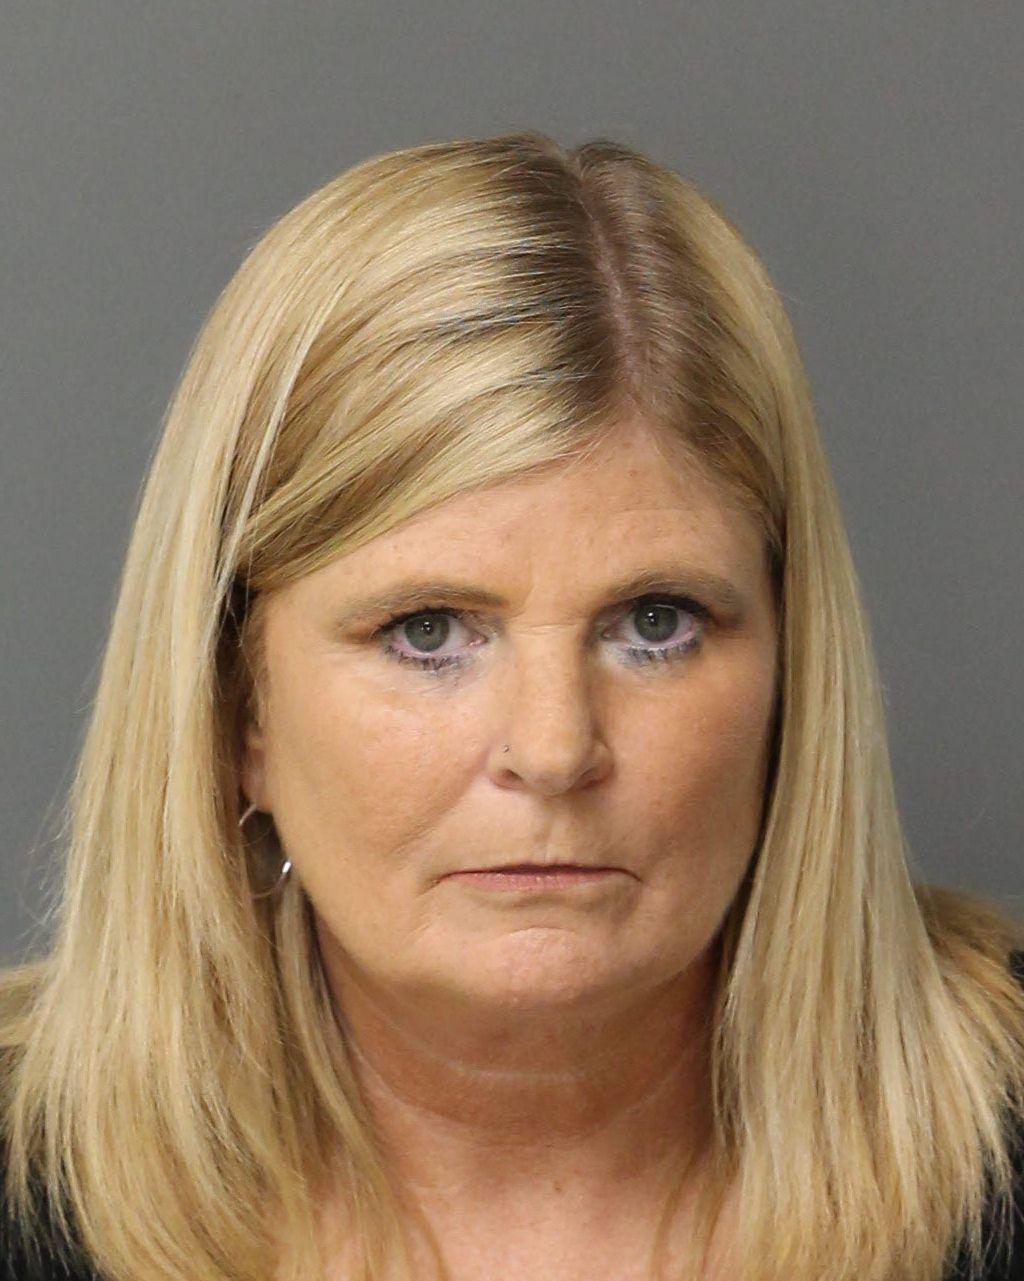 HUTCHENS KRISTI MICHELLE Mugshot / County Arrests / Wake County Arrests